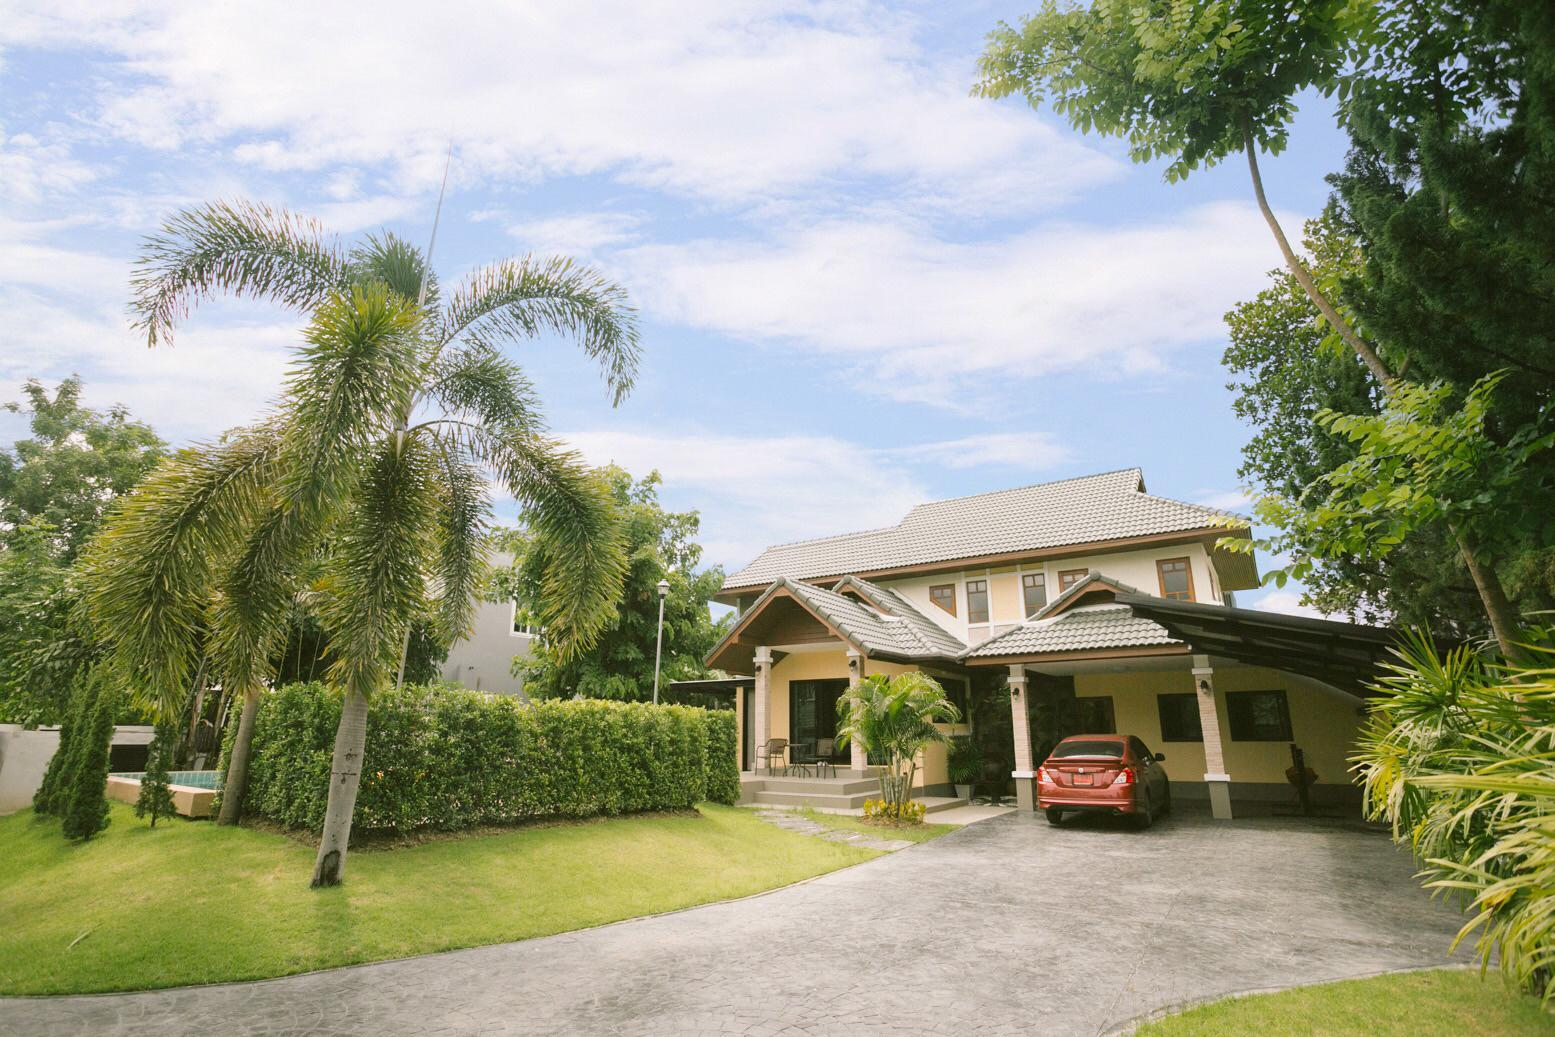 Y'S chiang mai  swimming pool villa,5 ห้องนอน 3 ห้องน้ำส่วนตัว ขนาด 340 ตร.ม. – สุเทพ